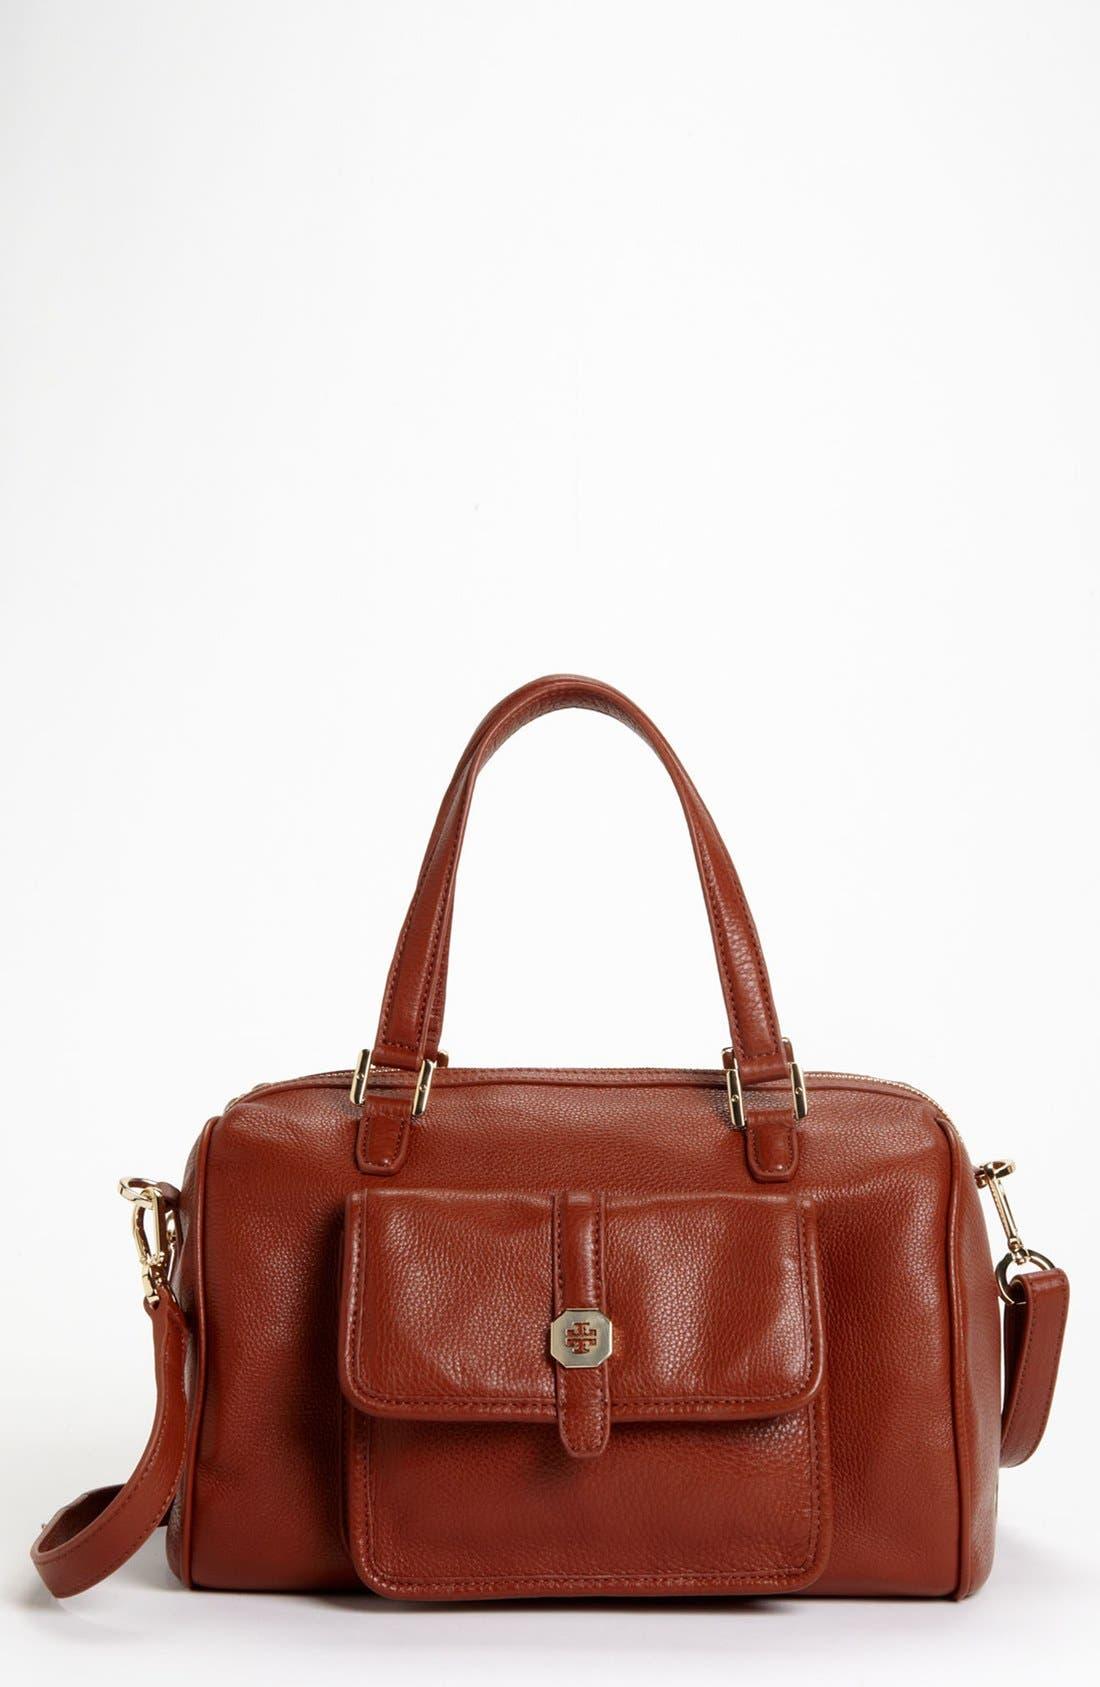 Main Image - Tory Burch 'Clay' Leather Satchel, Medium